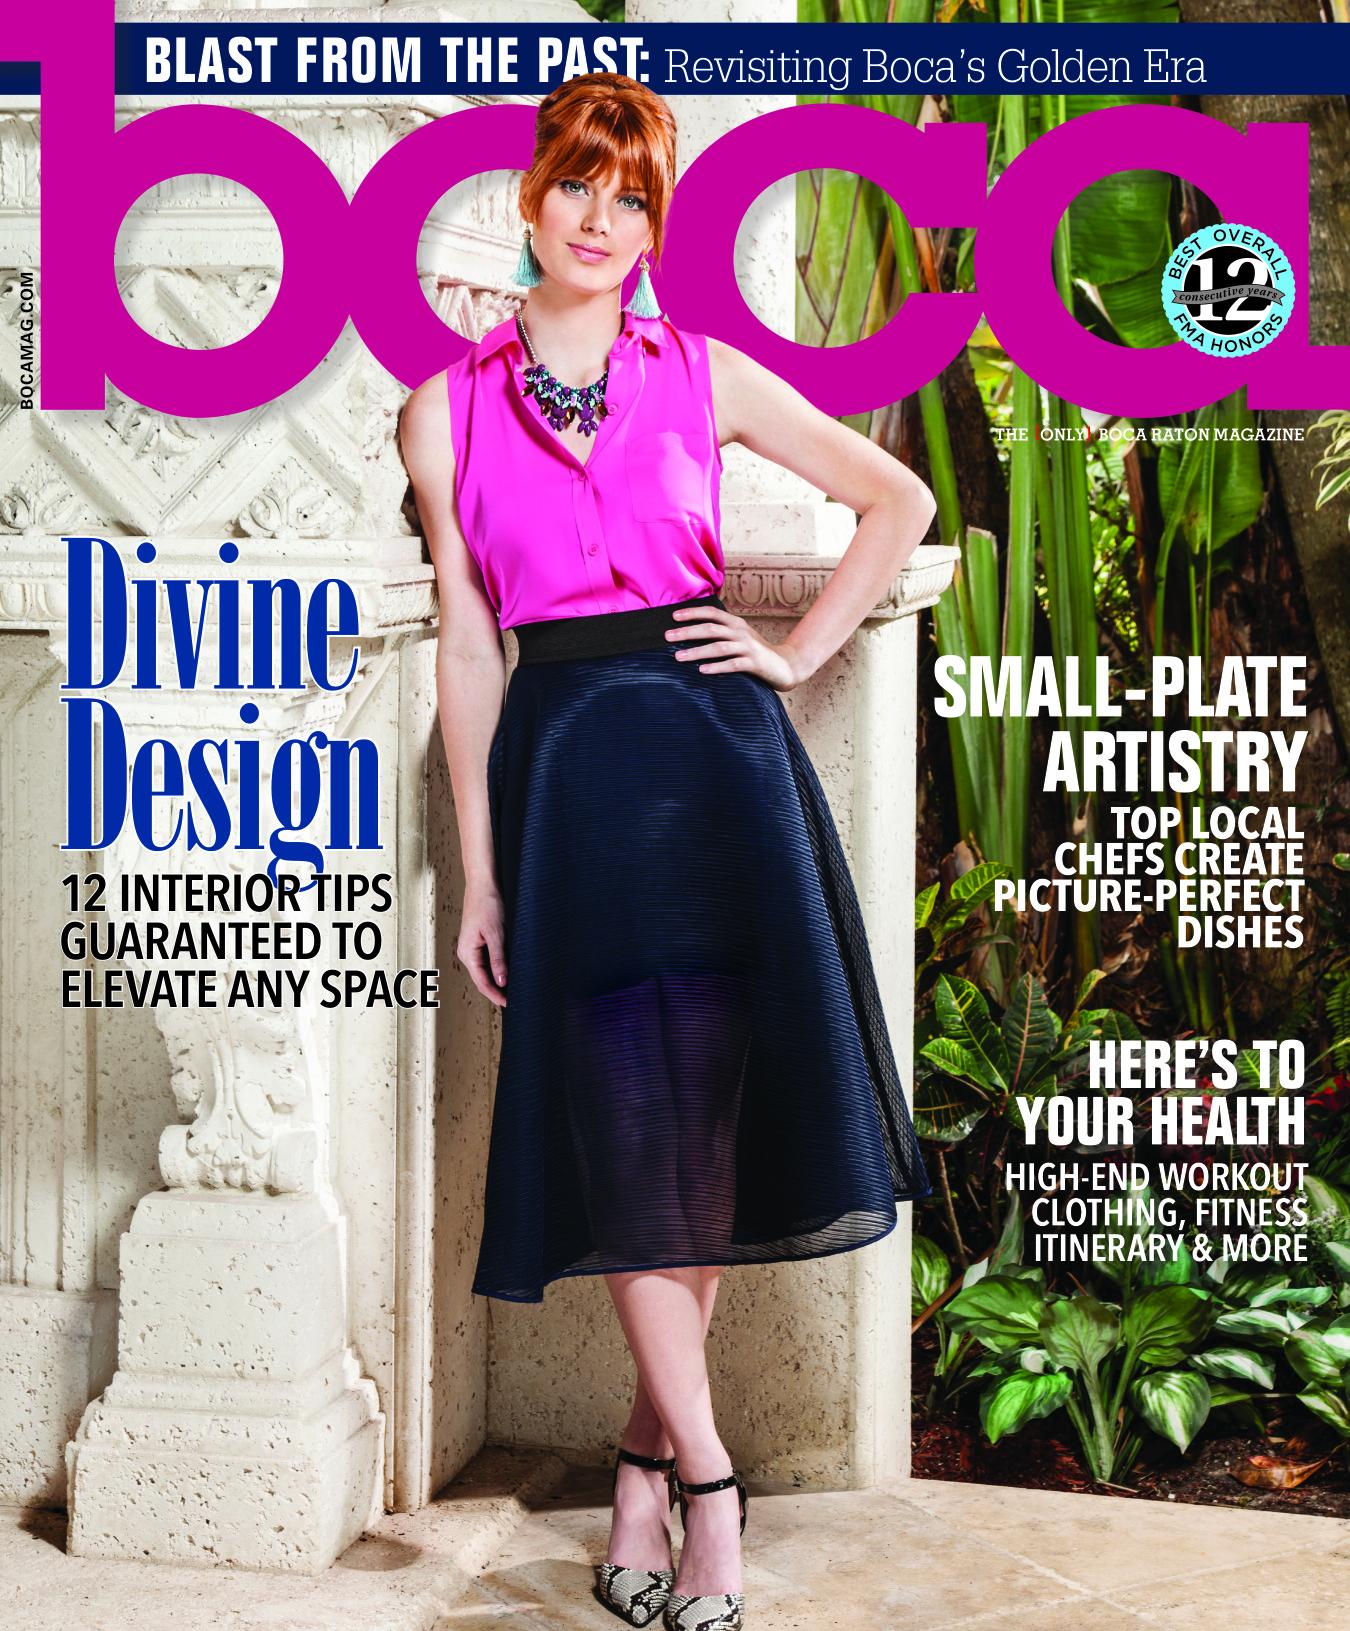 Boca Magazine